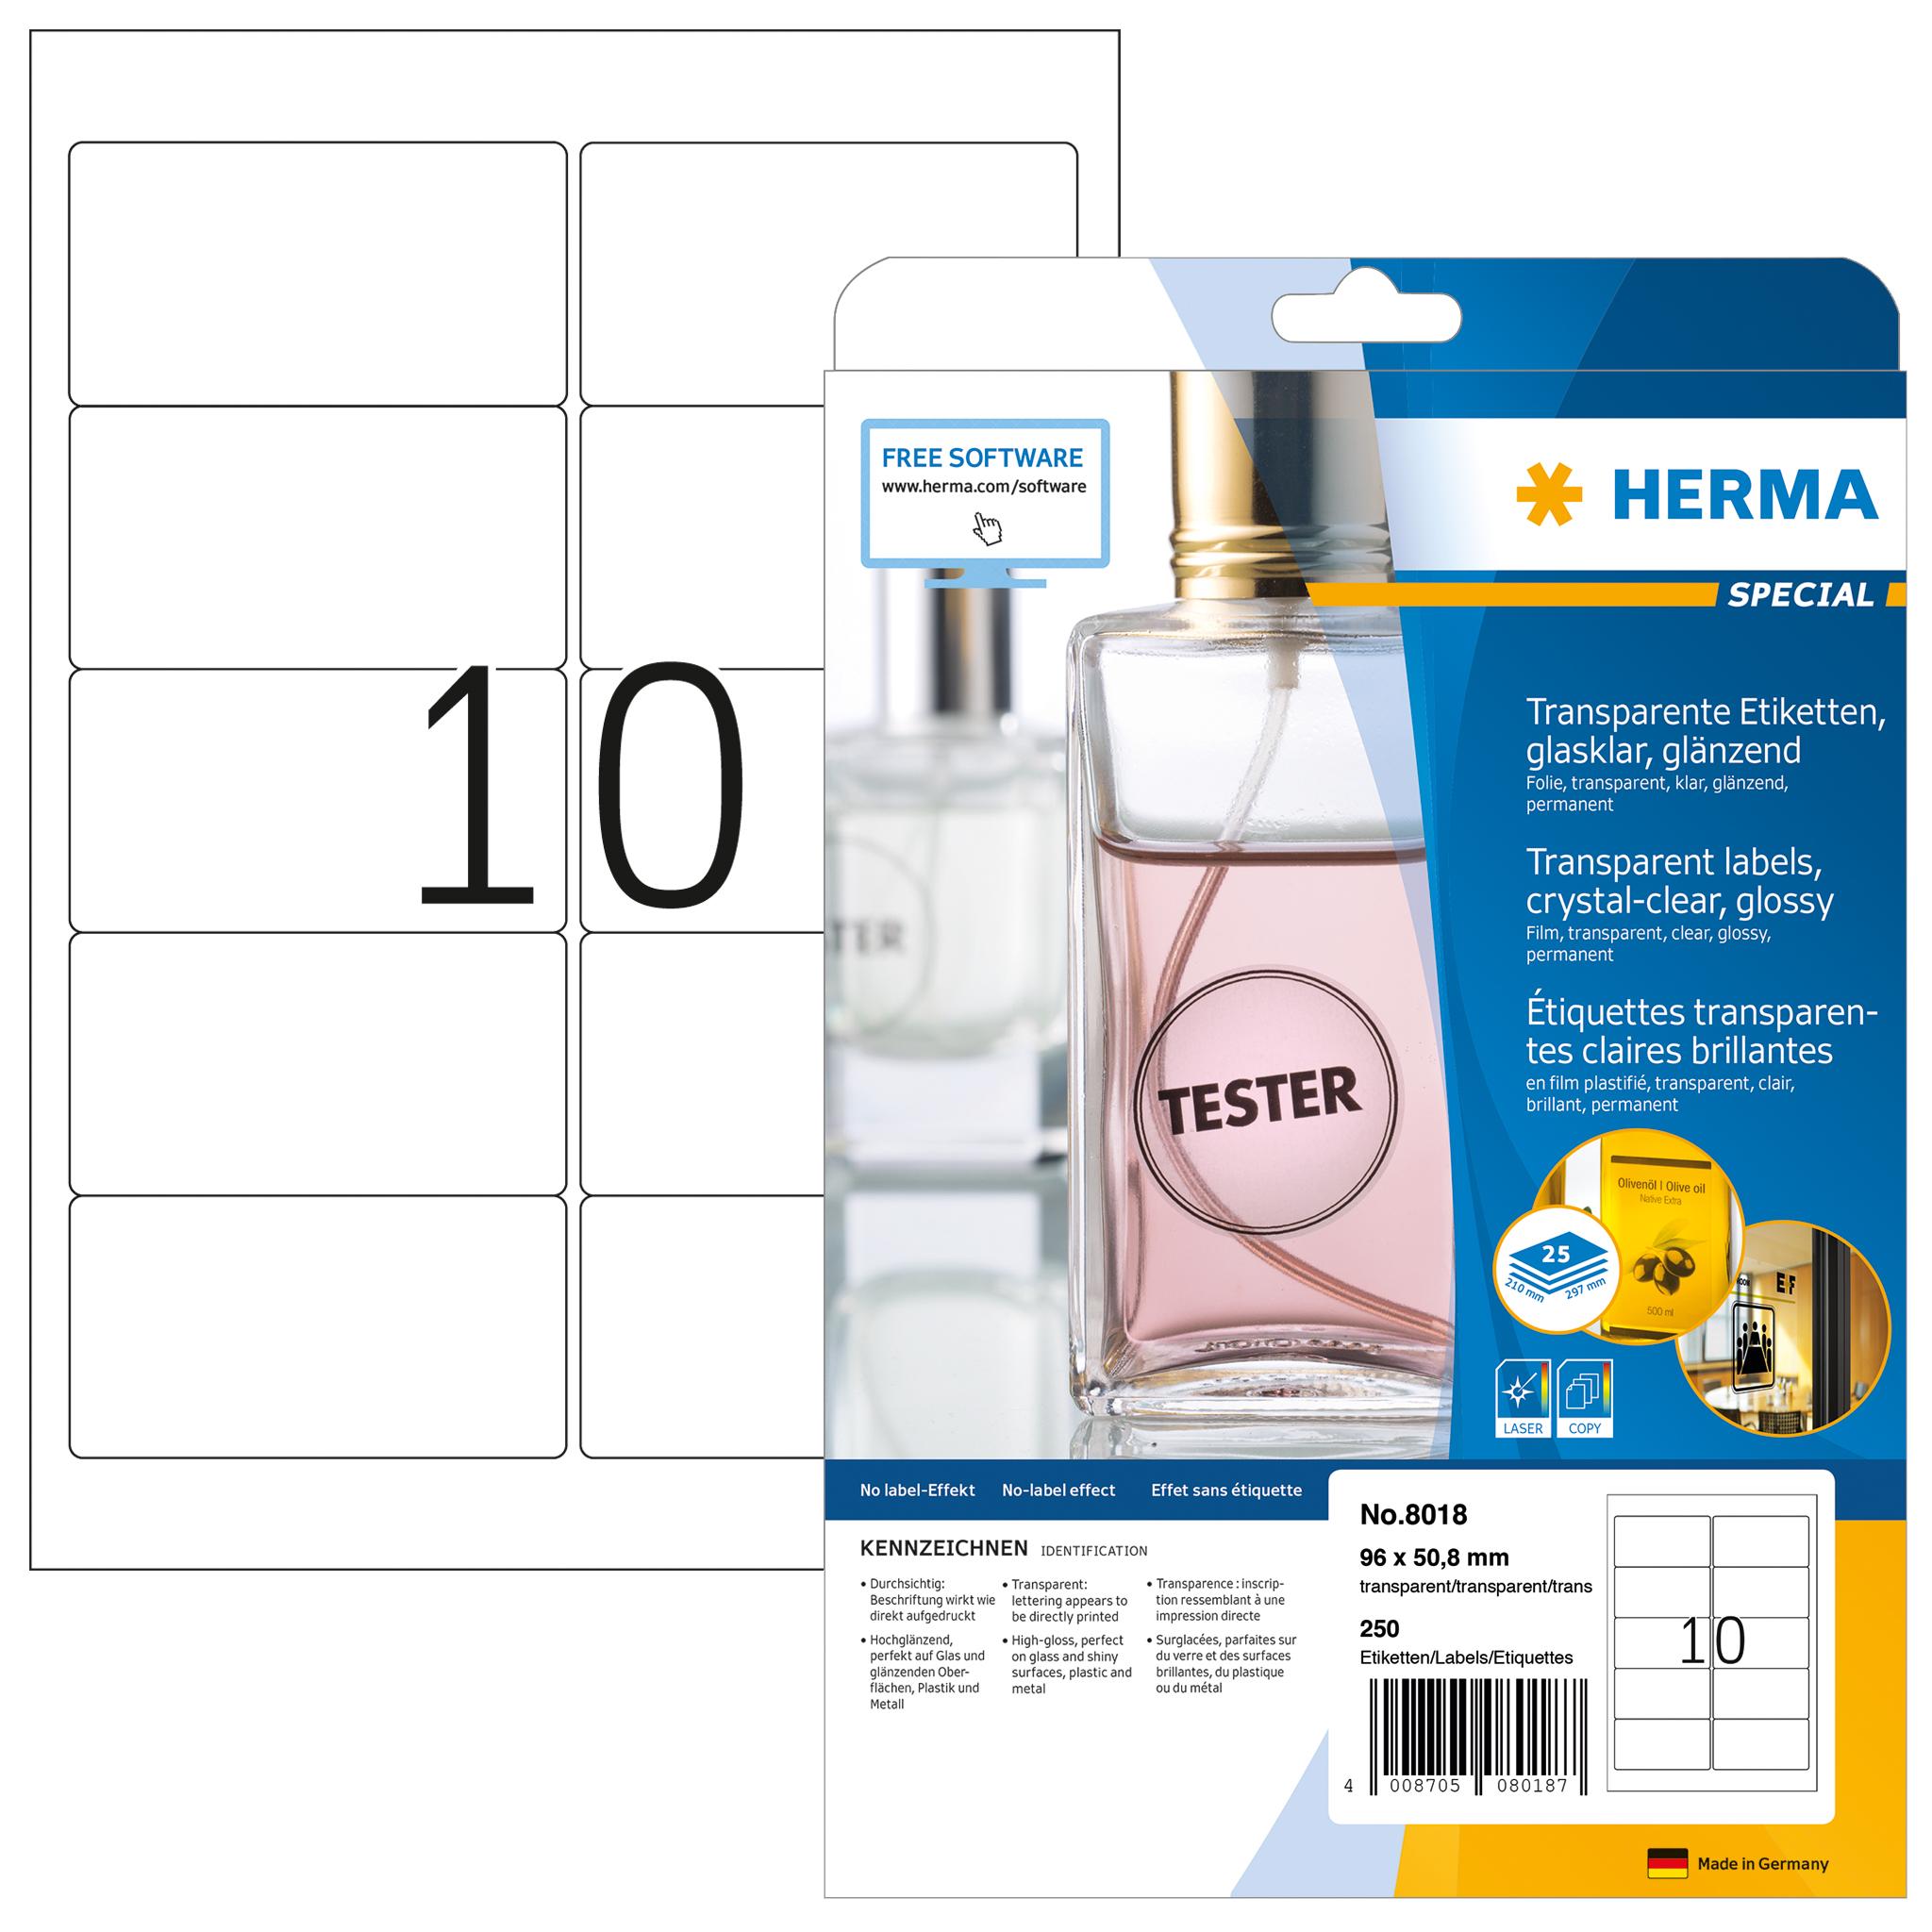 Etiketten transparent A4 - HERMA 8018 - 96x50,8 mm 250 St.